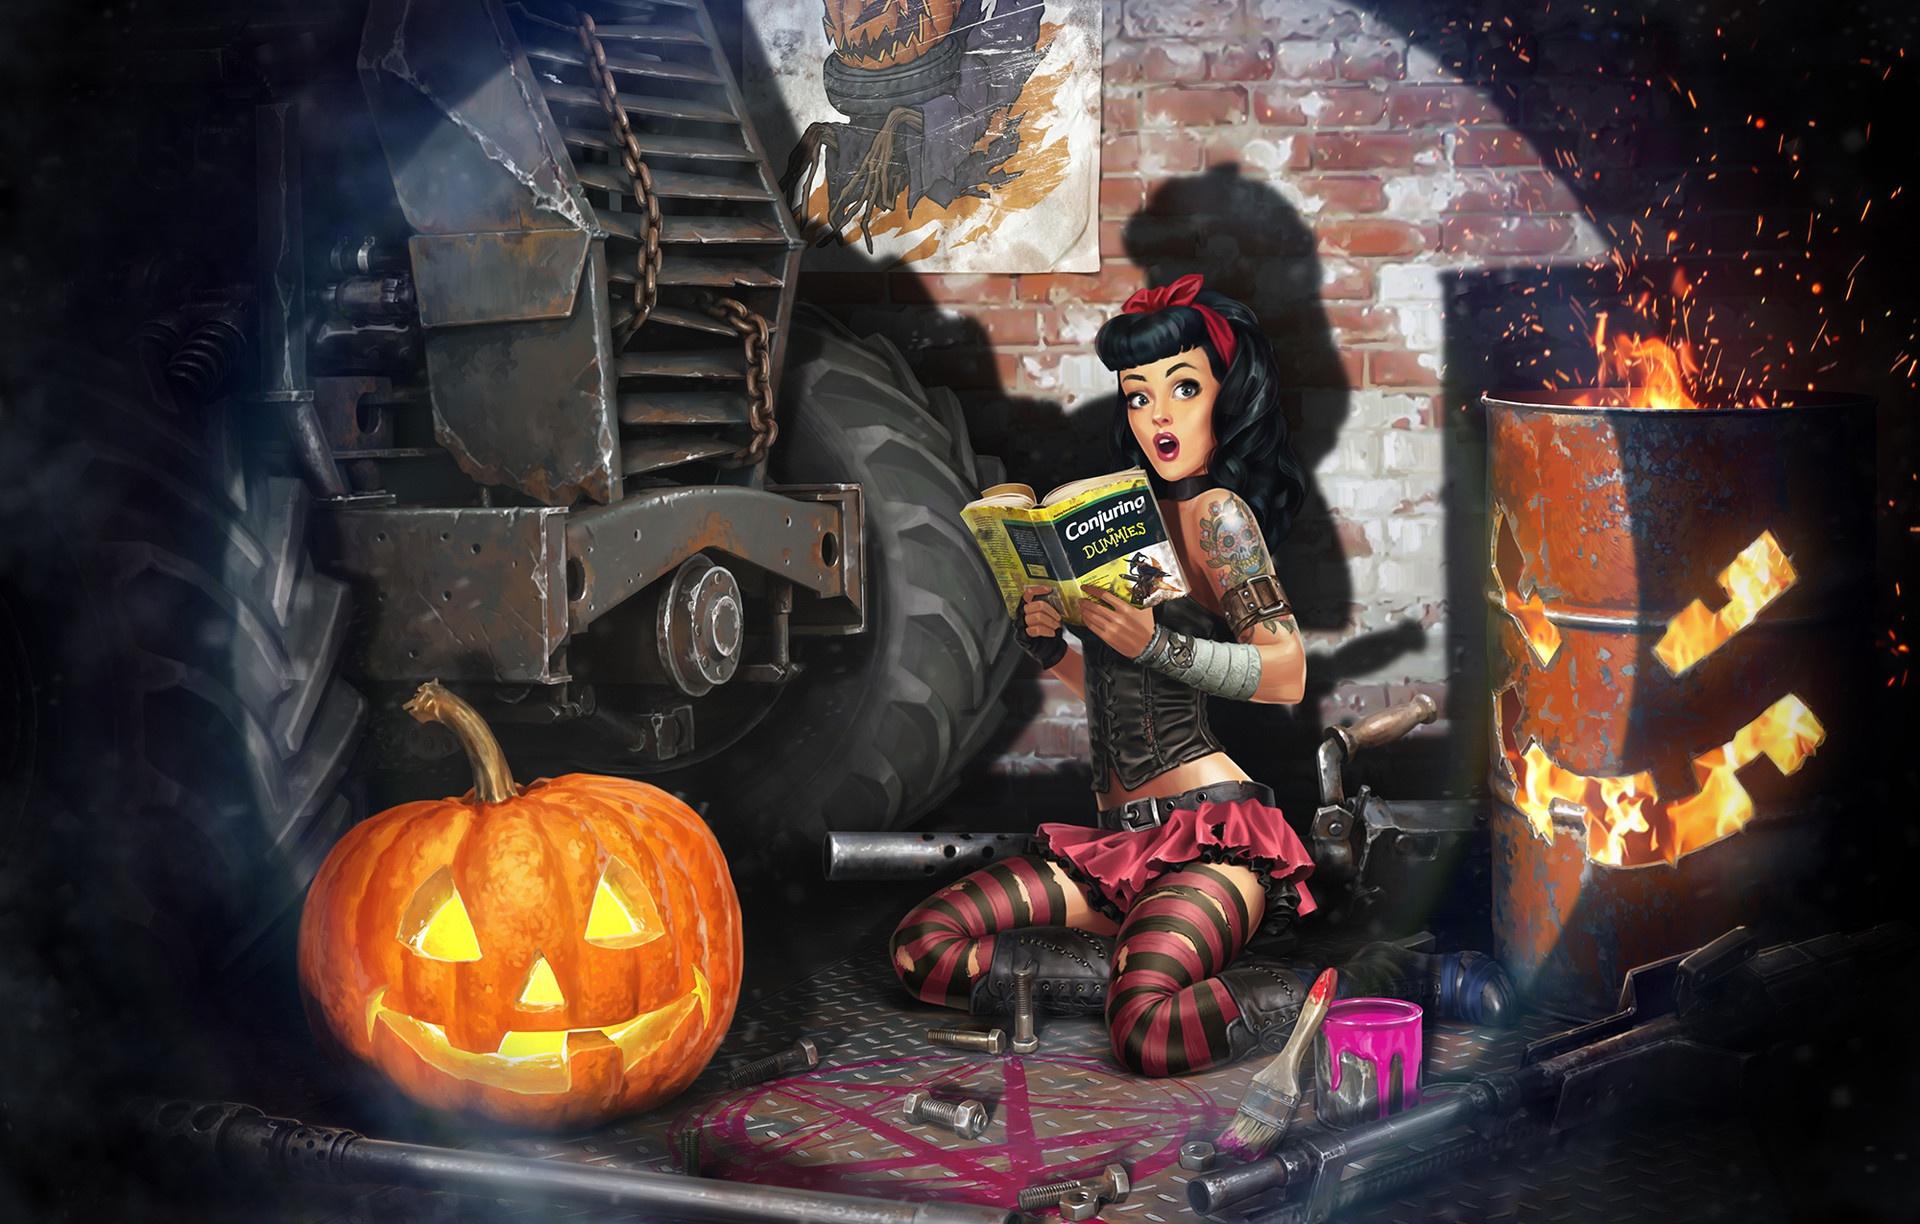 General 1920x1224 fantasy art fantasy girl artwork pumpkin